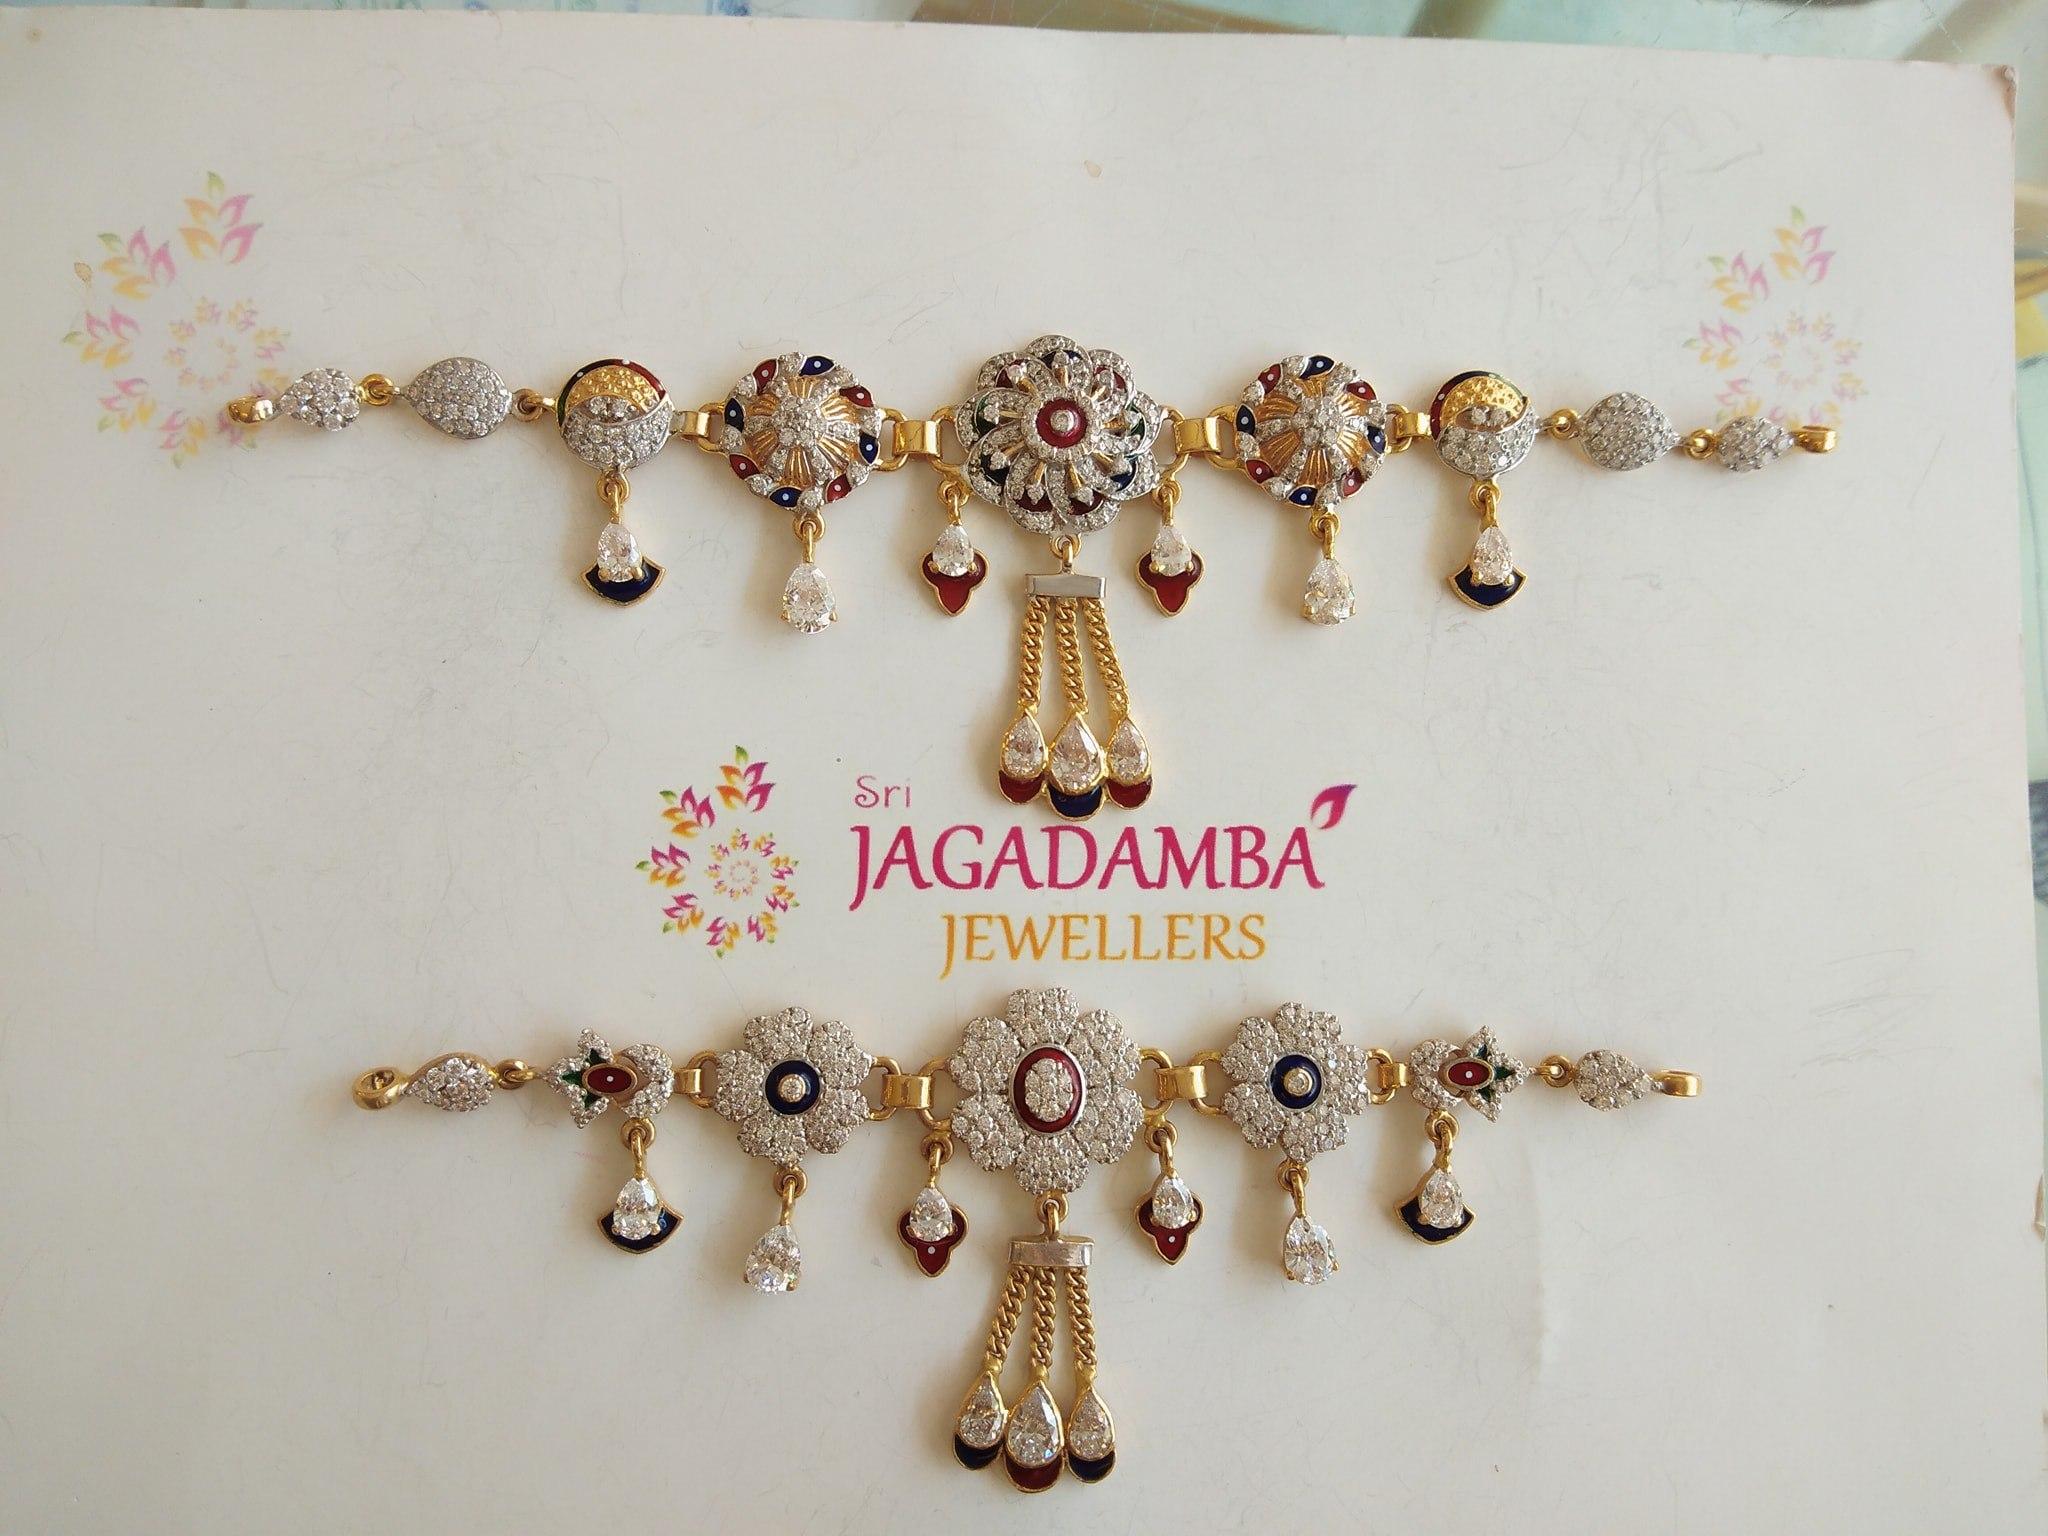 New Marwah Collection CZ with Jaipur Minakari work  Choker Cum Baju Bandh Wt 30gm 26gm 2020-09-17